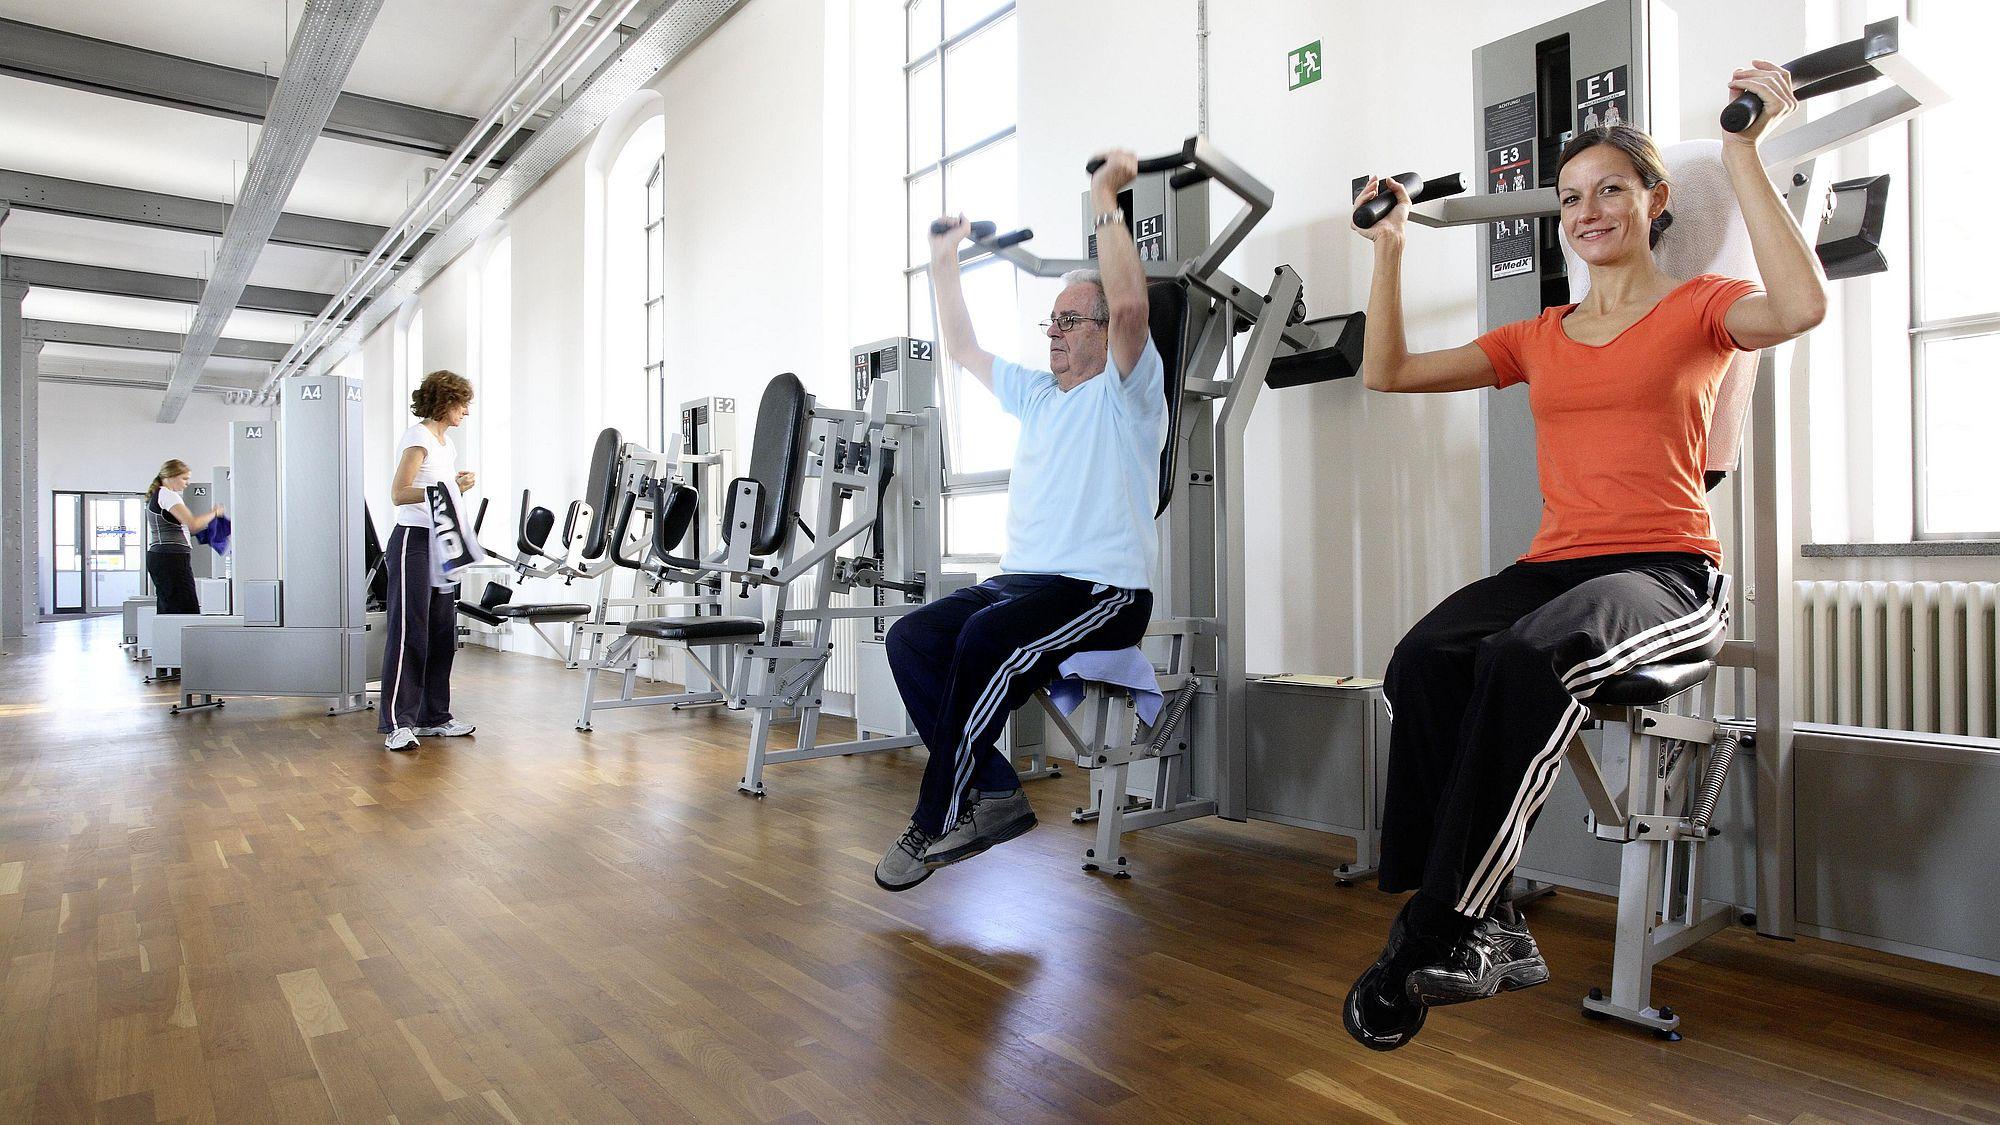 Ihr Fitnessstudio in Augsburg | Kieser Training